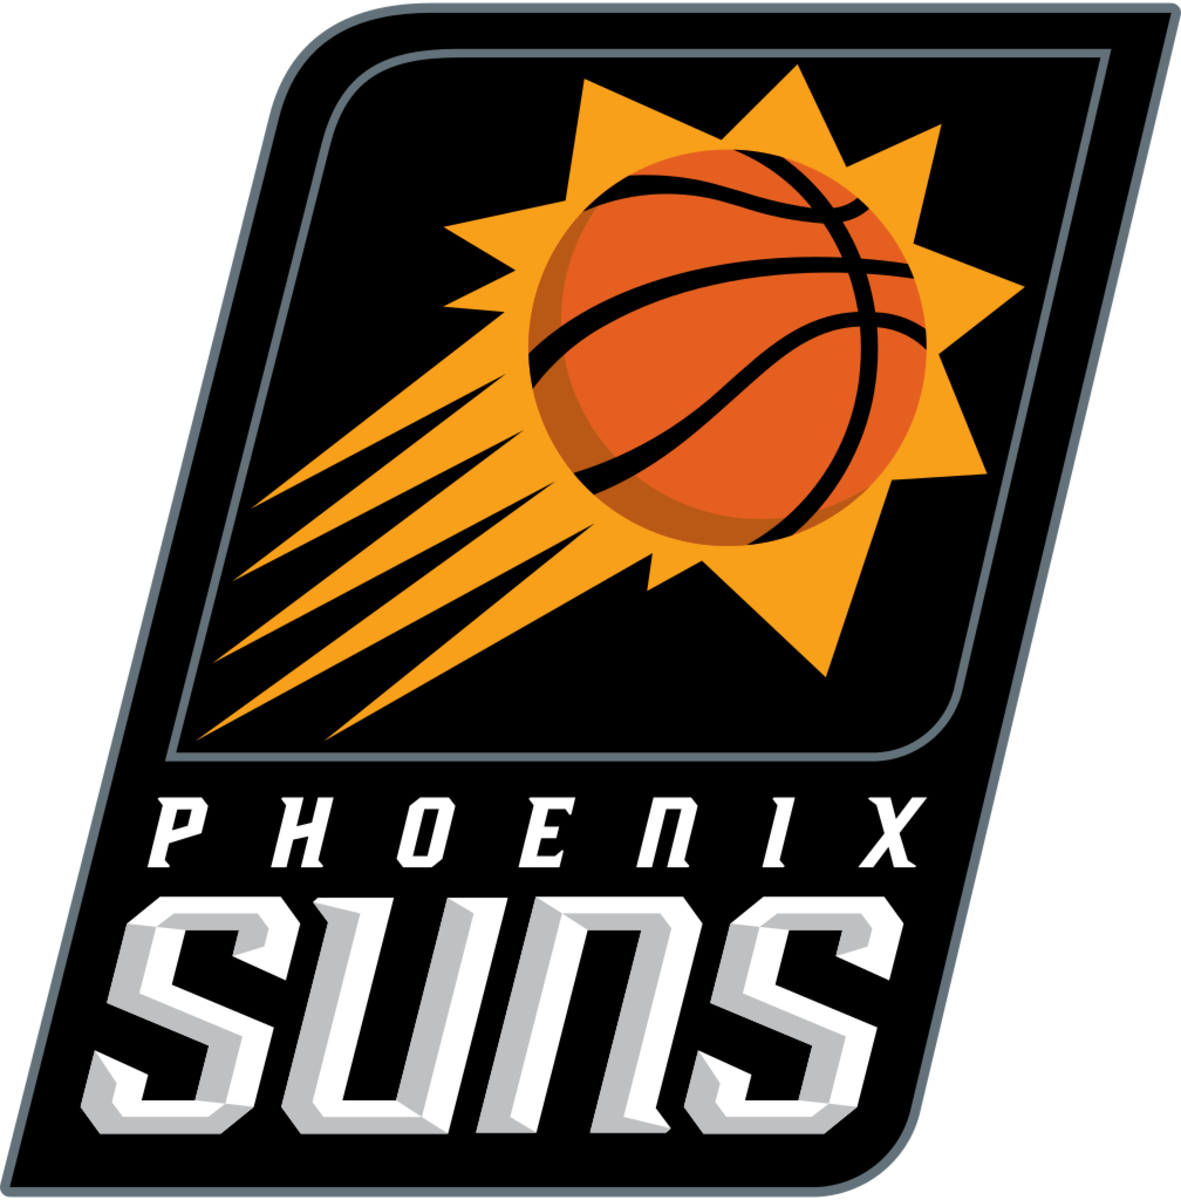 Phoenix_Suns_logo.svg